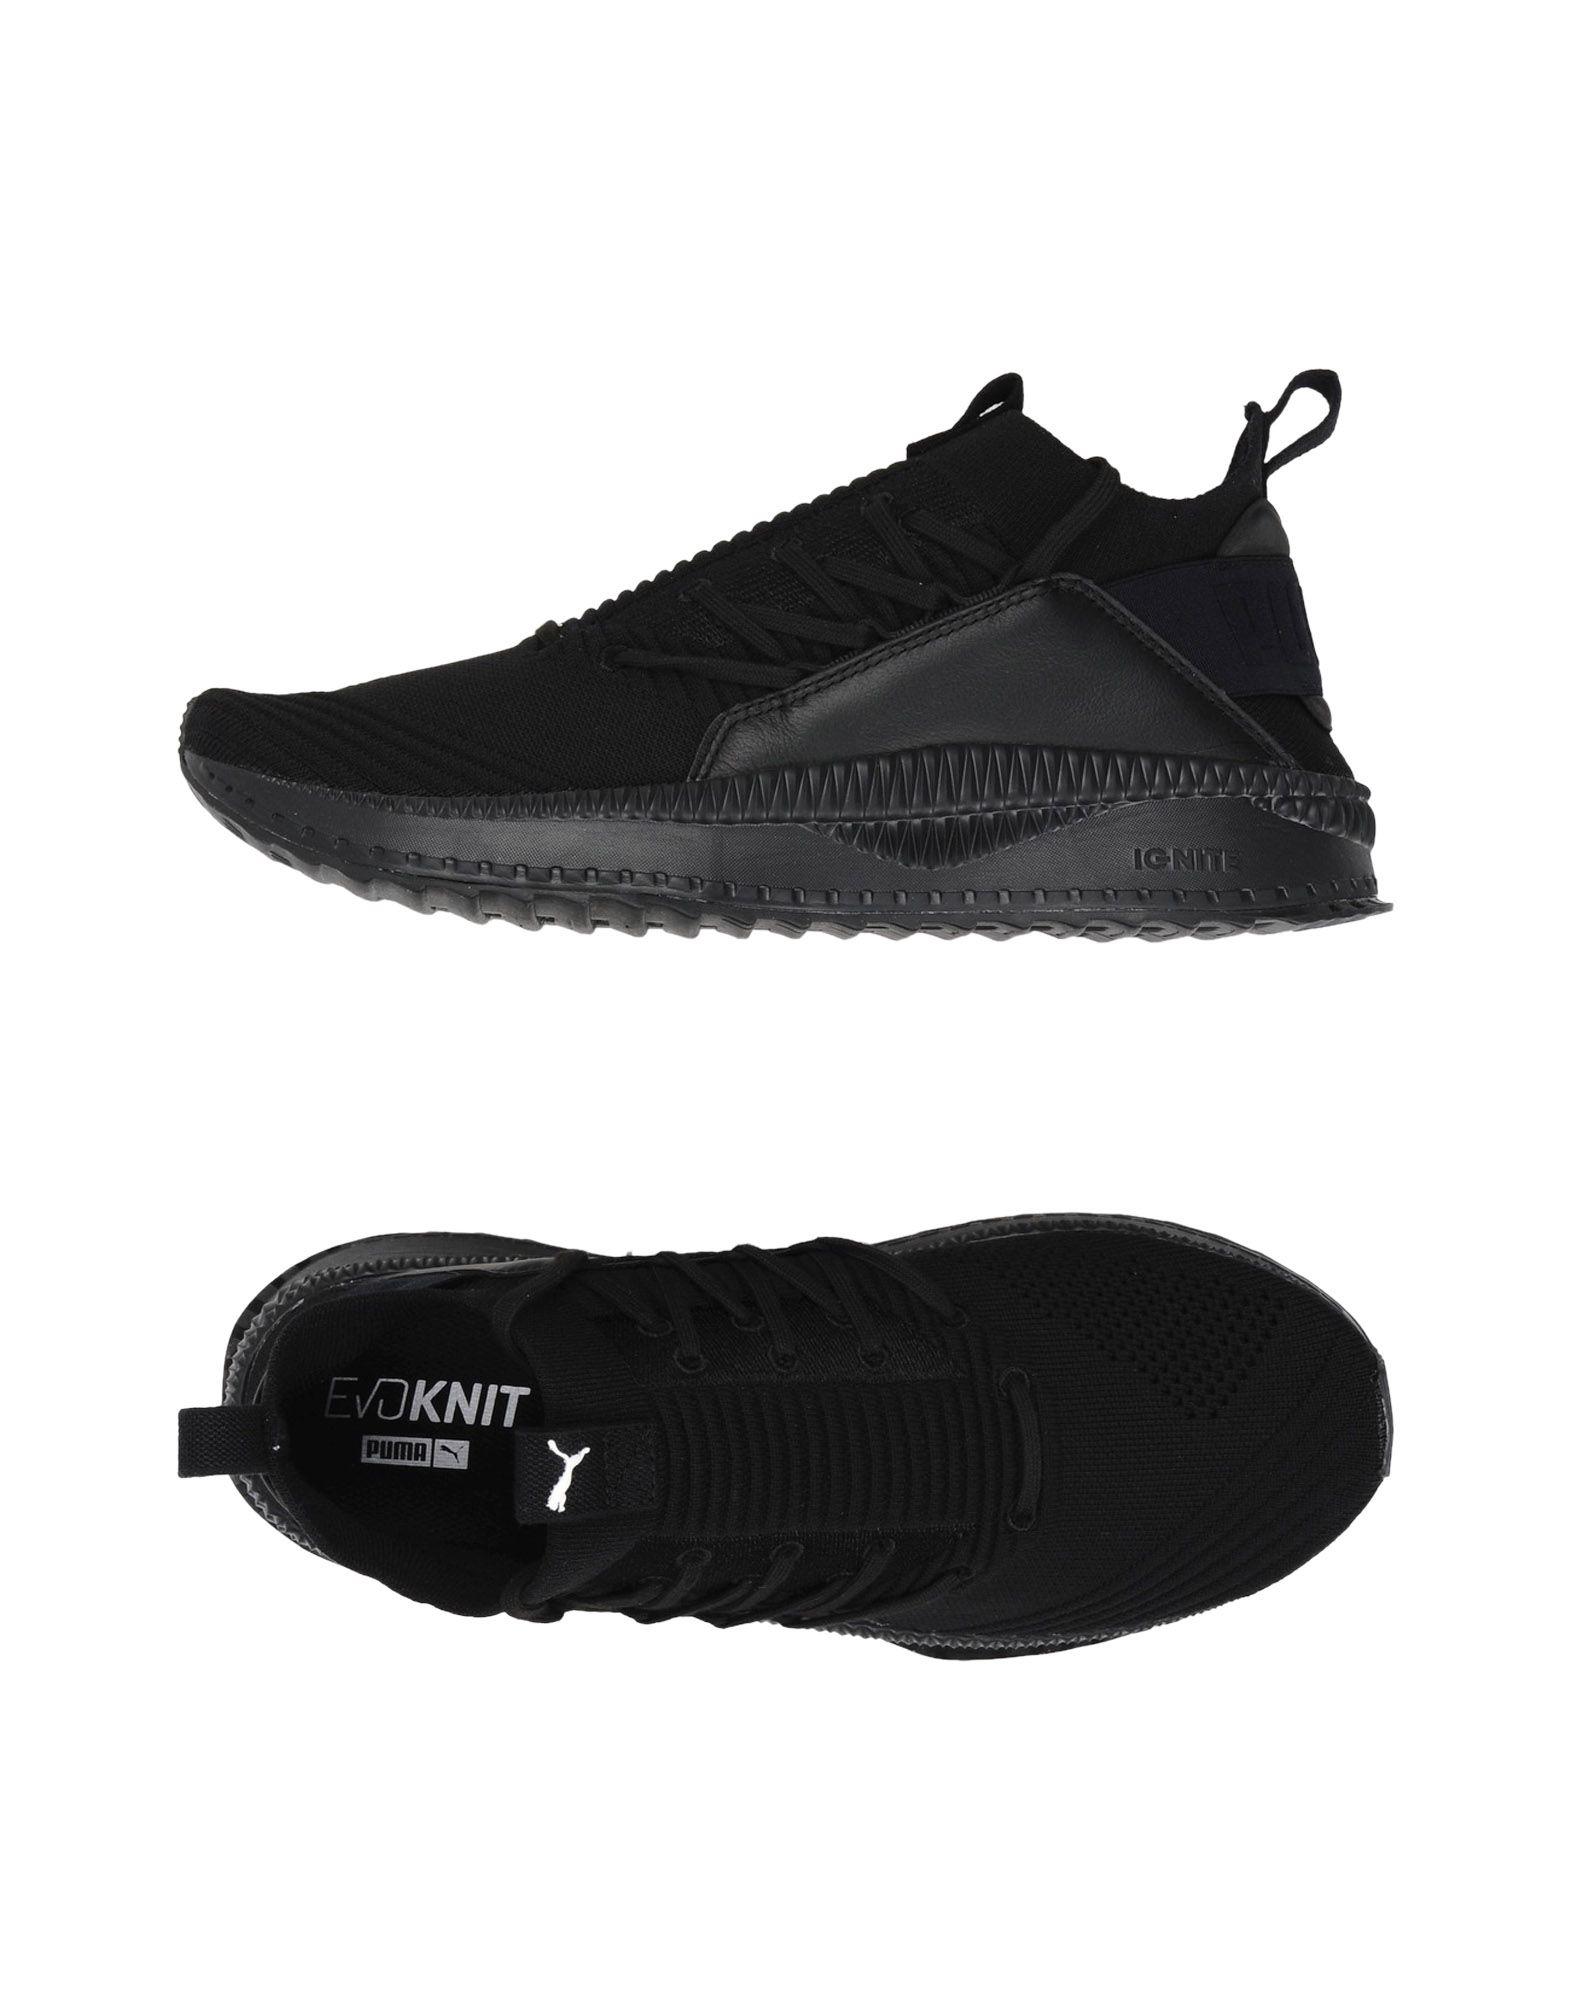 Puma Tsugi Jun - Sneakers - Men Puma Sneakers Sneakers Sneakers online on  Australia - 11444701UJ 712efd